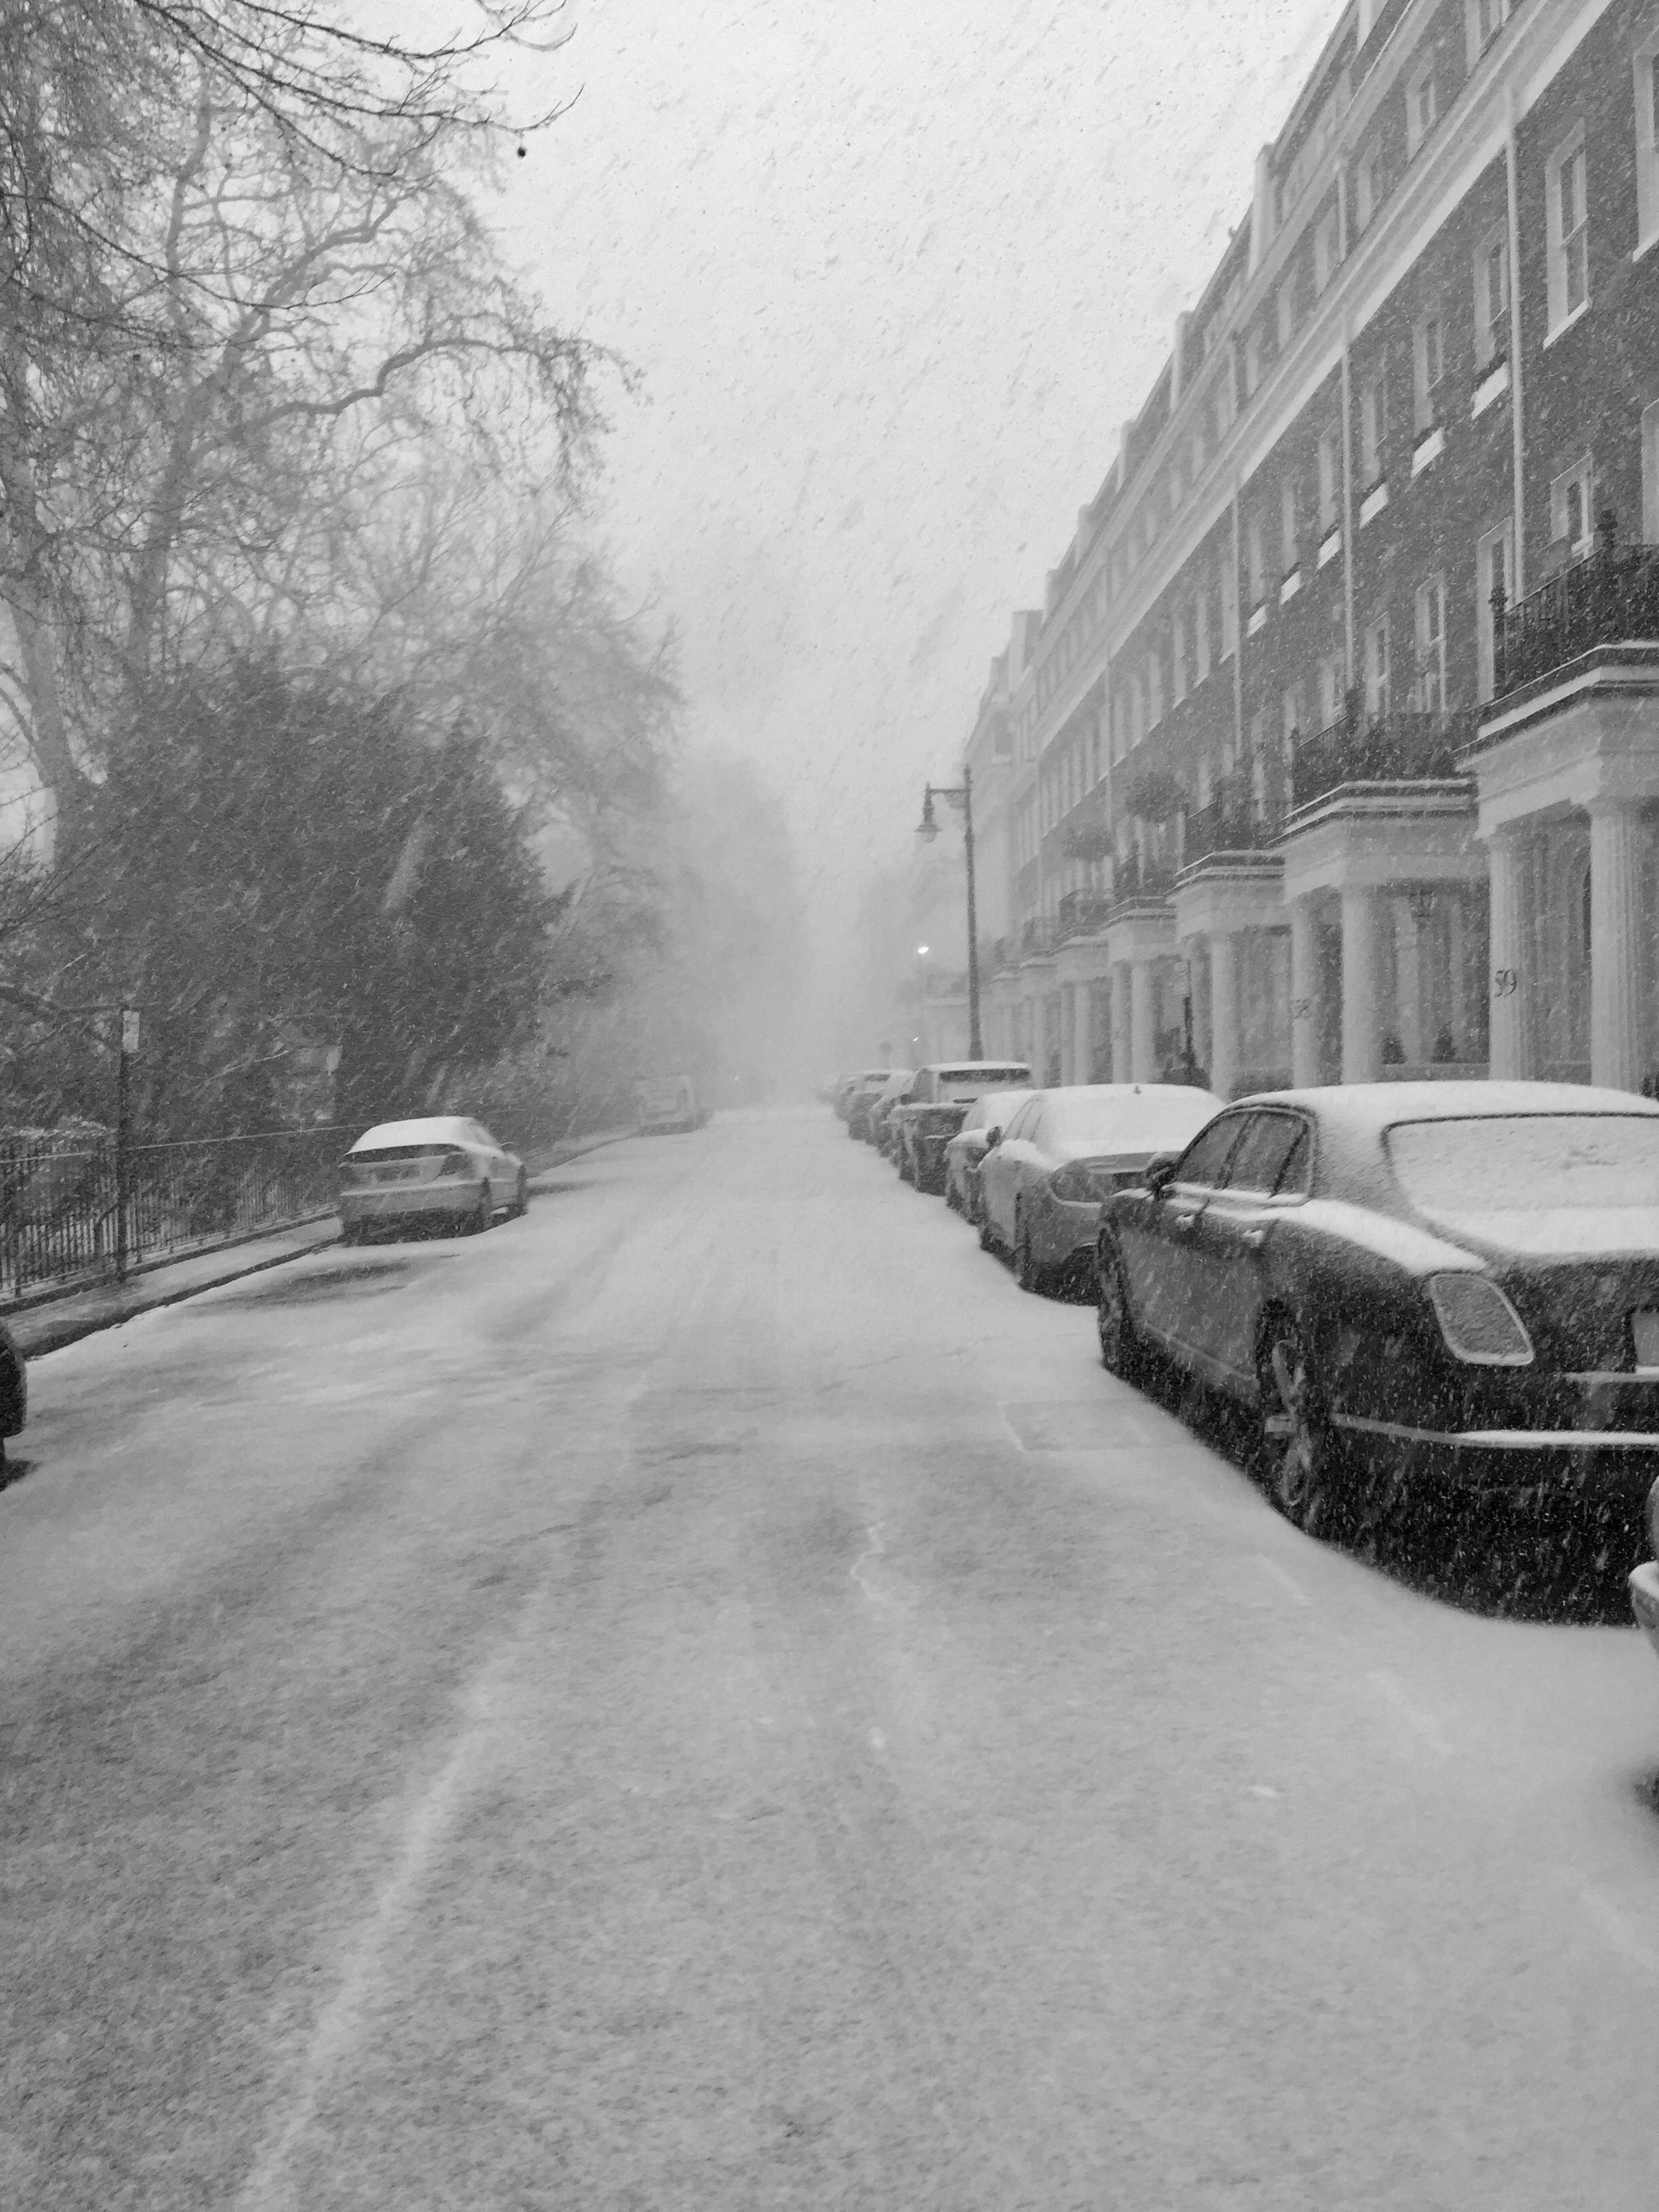 Snow in Eaton Square